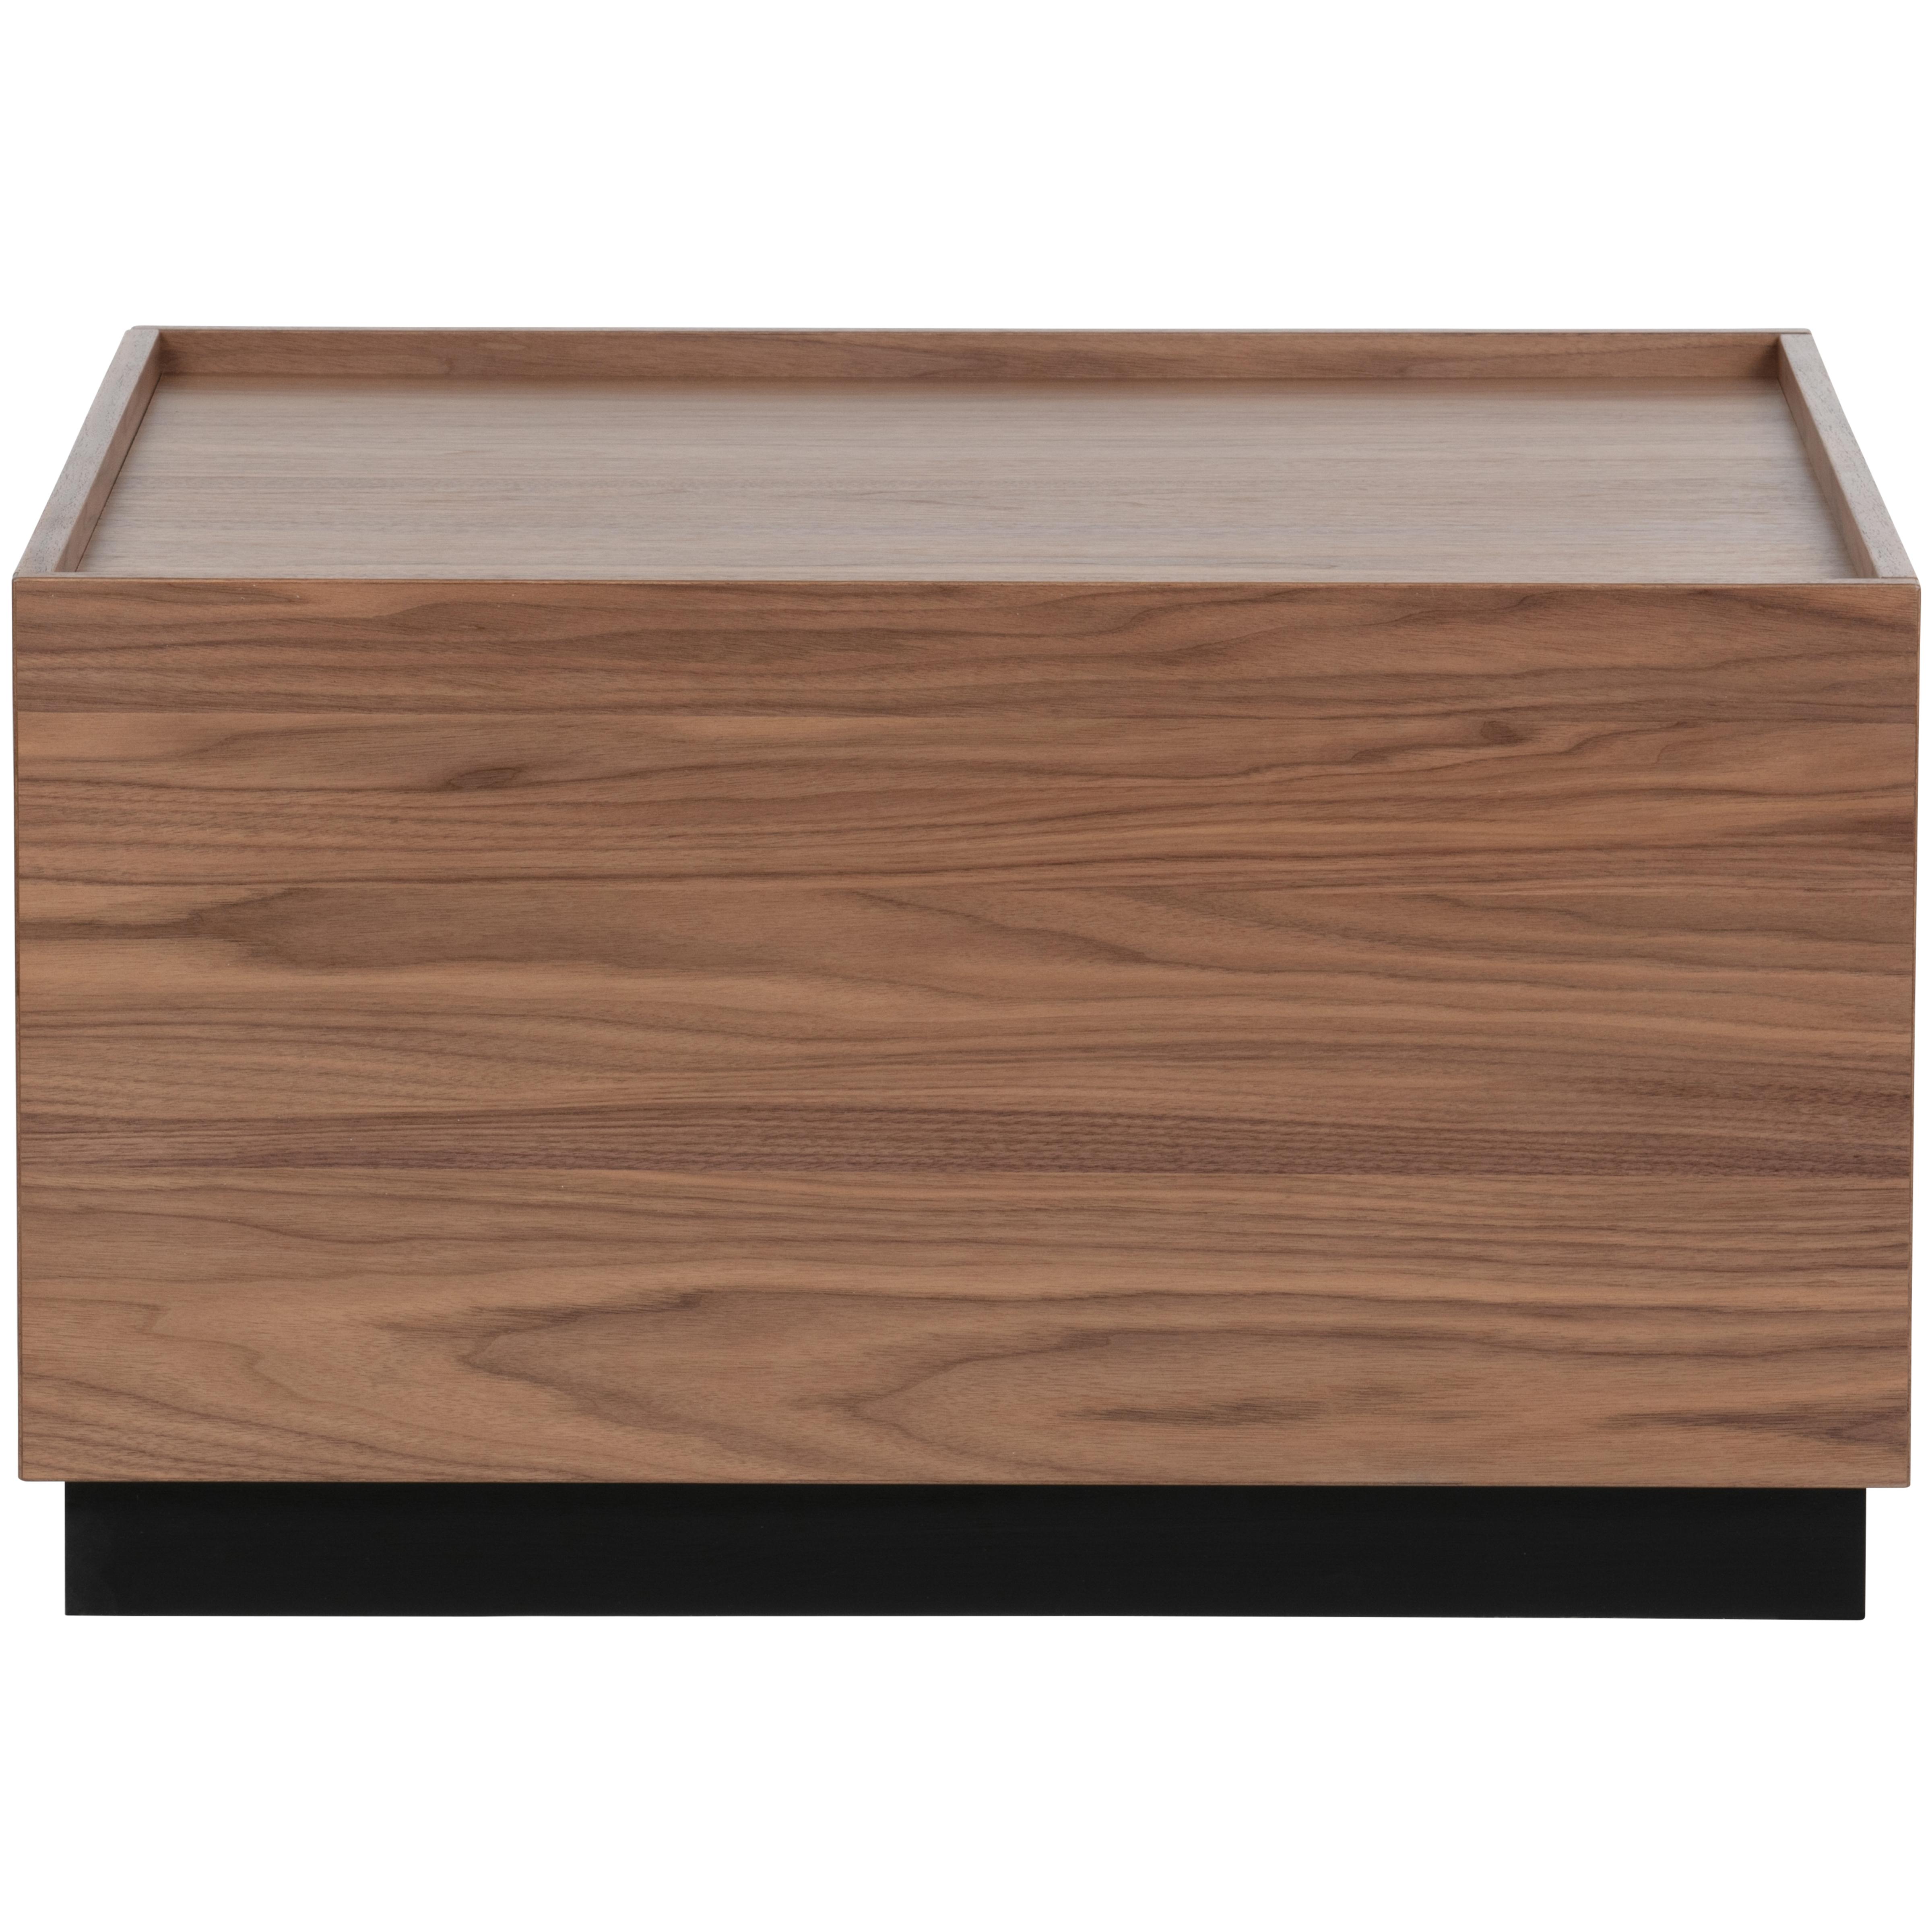 Table basse carrée en pin massif noyer